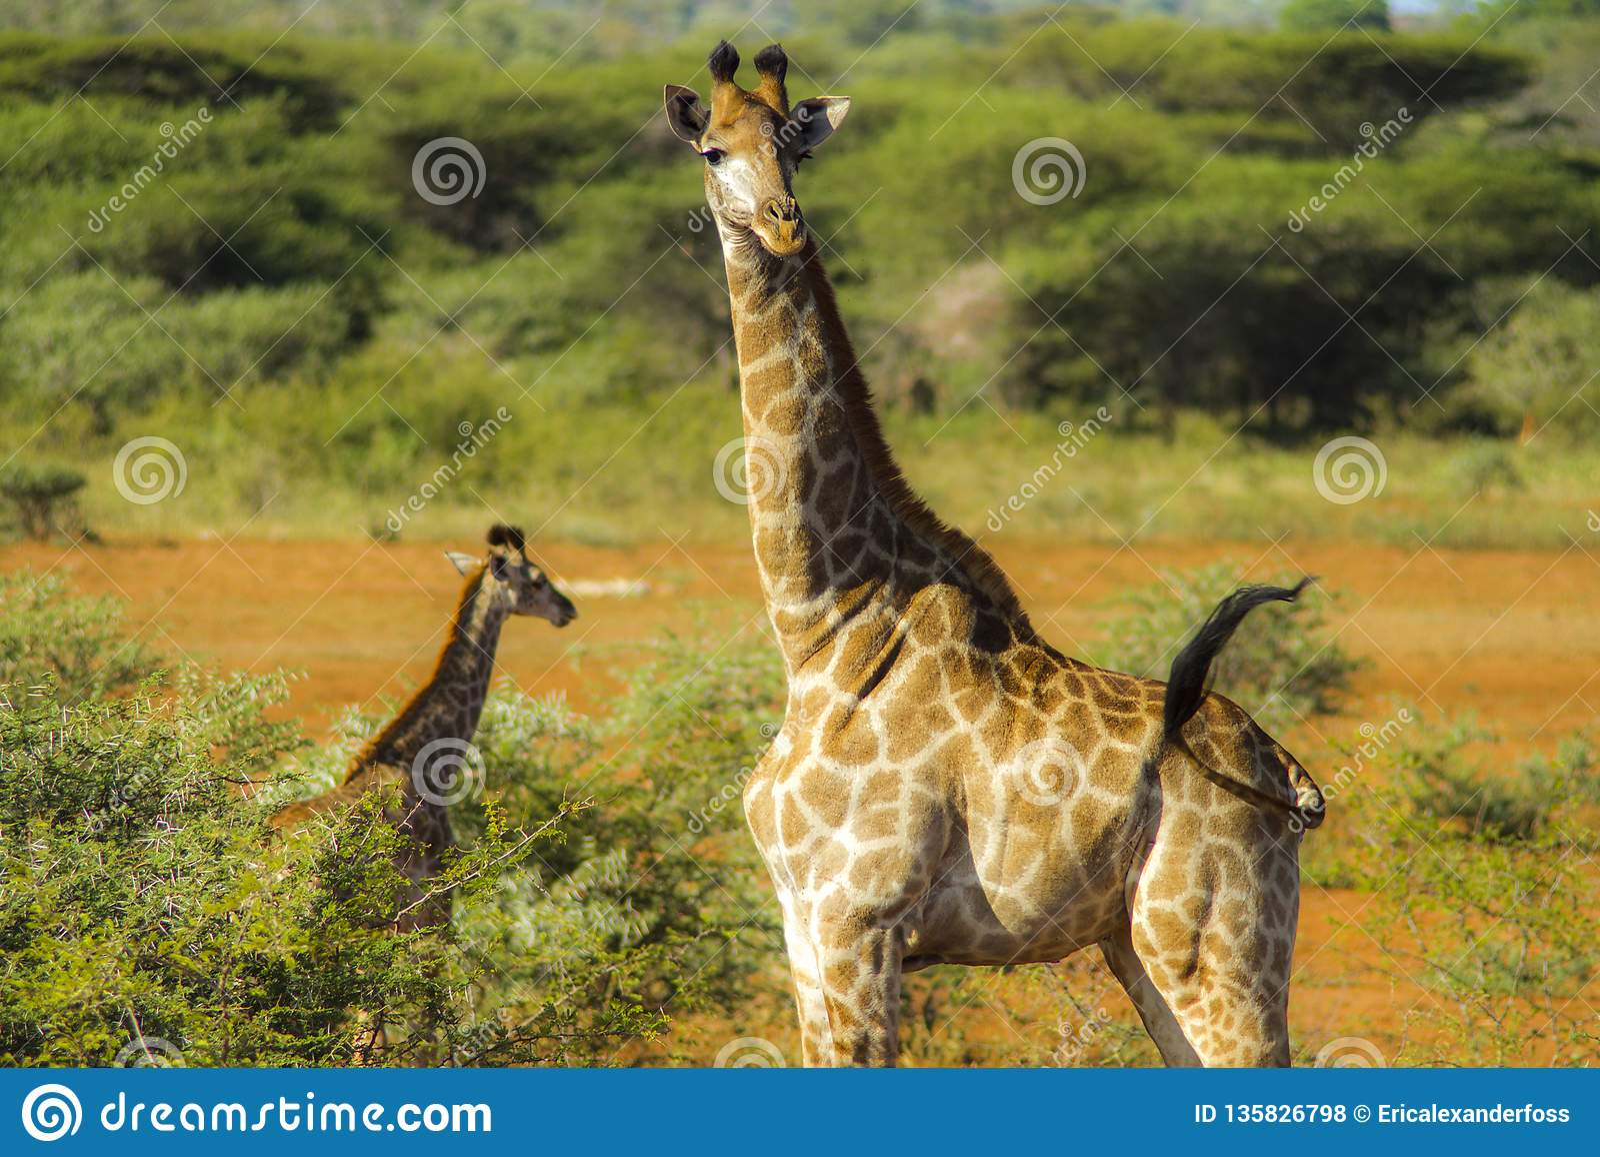 Mother Giraffe guides her baby through the savanna